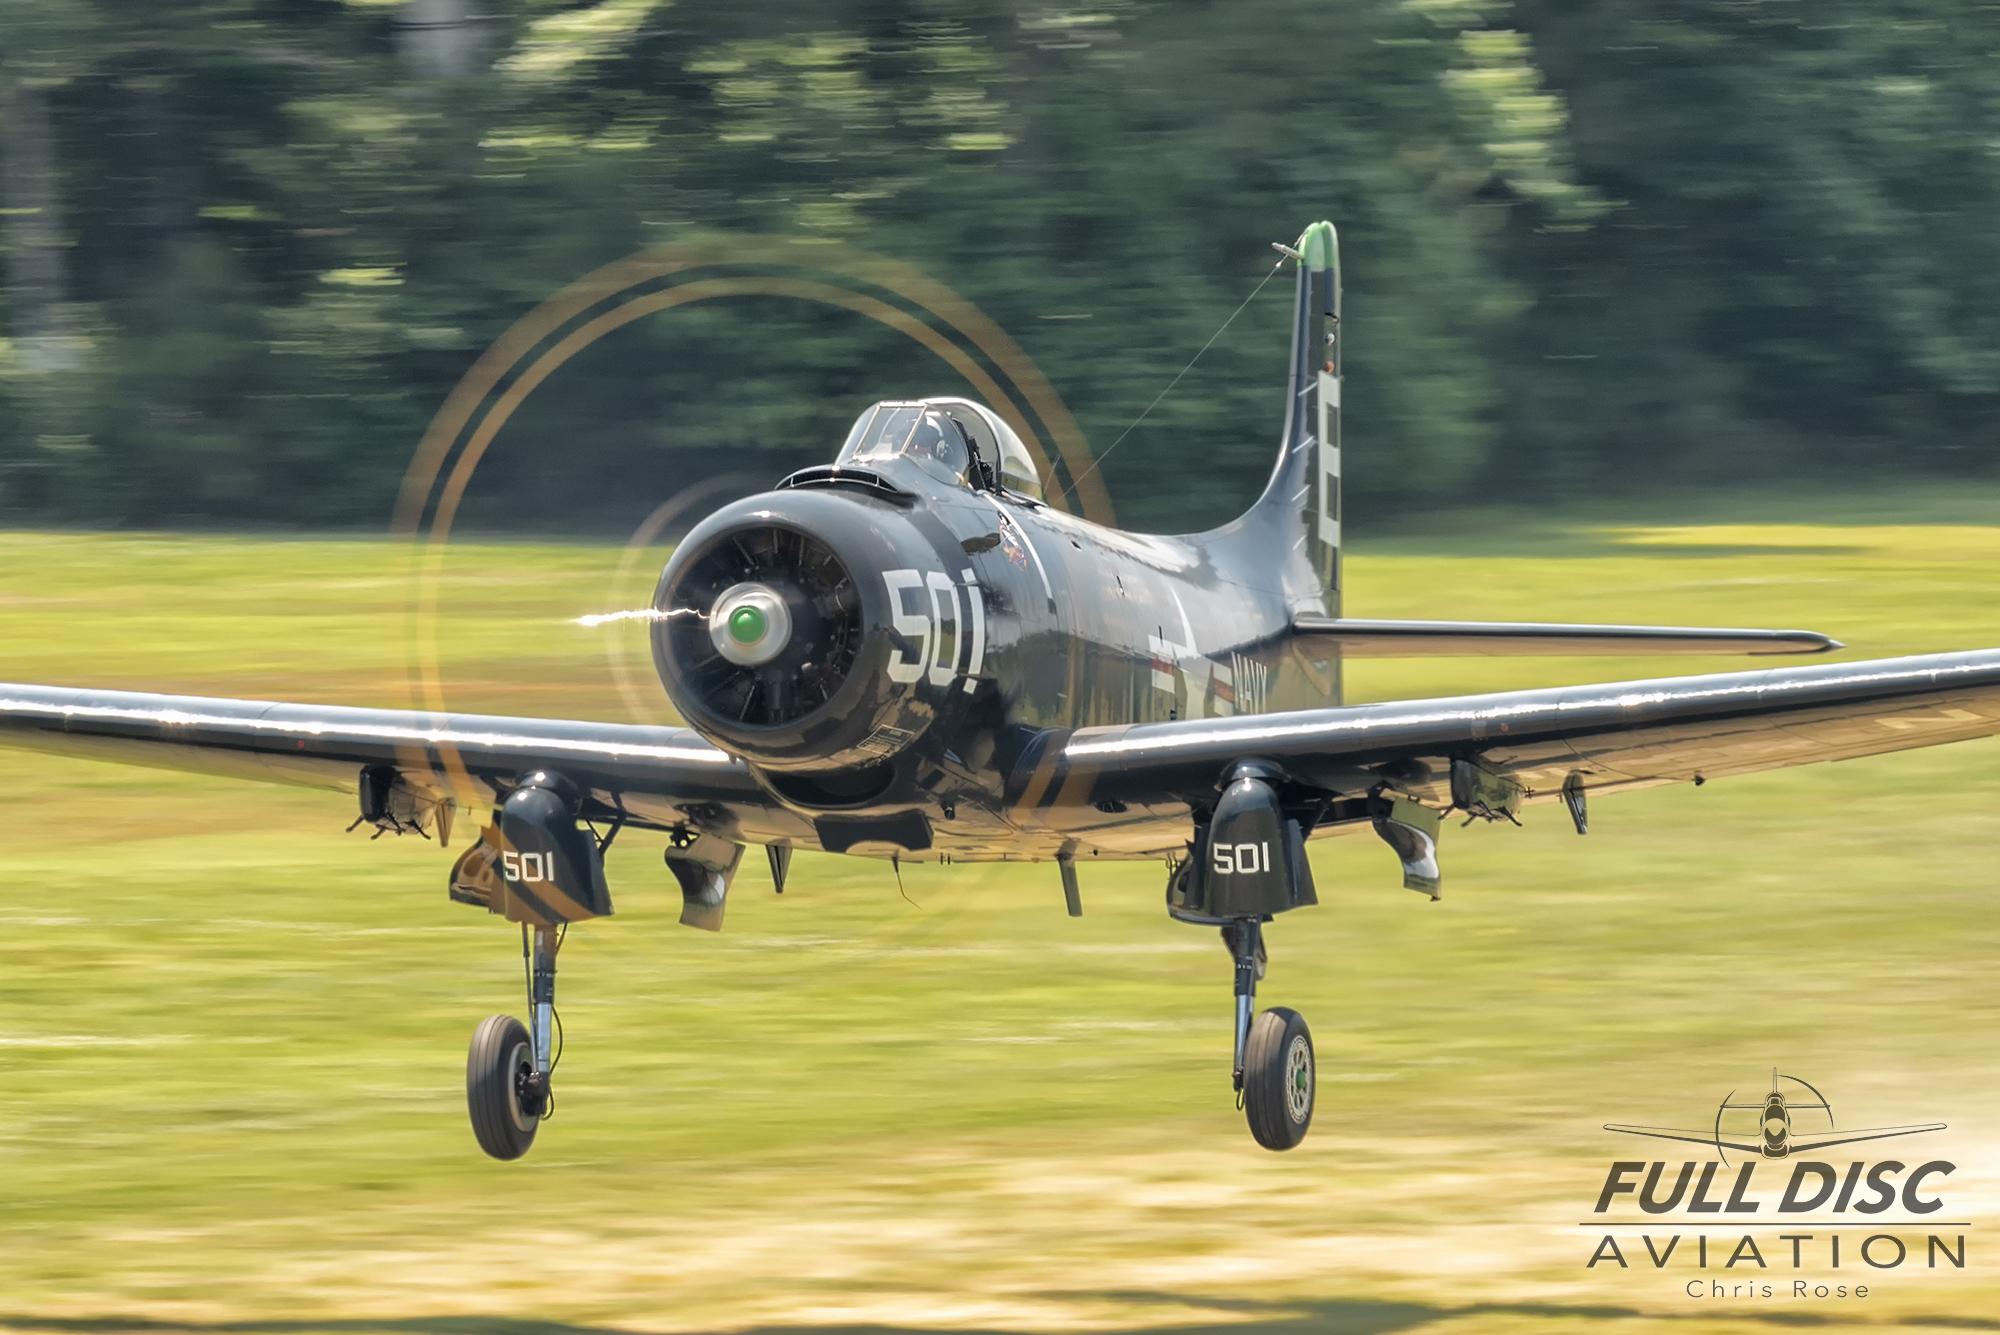 warbirdsoverthebeach_fulldiscaviation_chrisrose_skyraider2.jpg